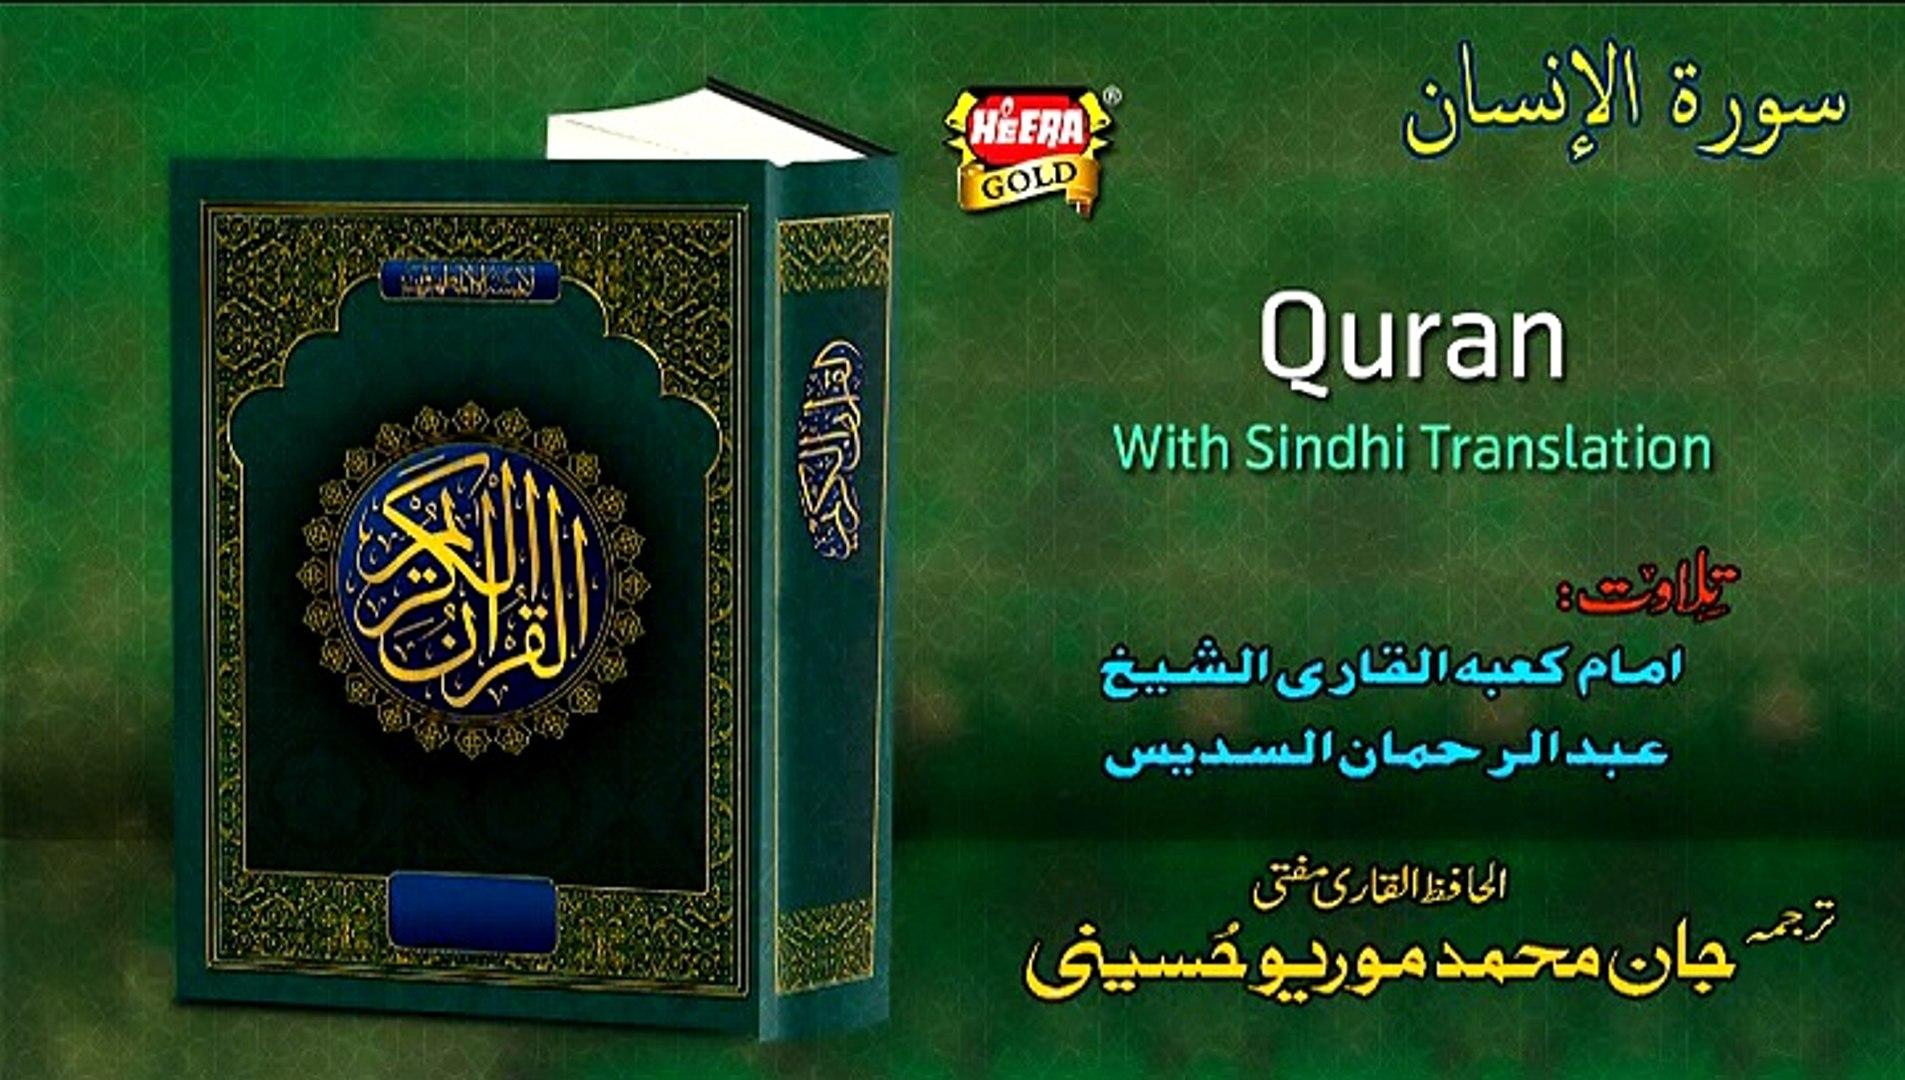 Al Rehman Al Sudais, Jan Muhammad Moriyo Hussaini - 76 Surah Dahar - Quran  With Sindhi Translation